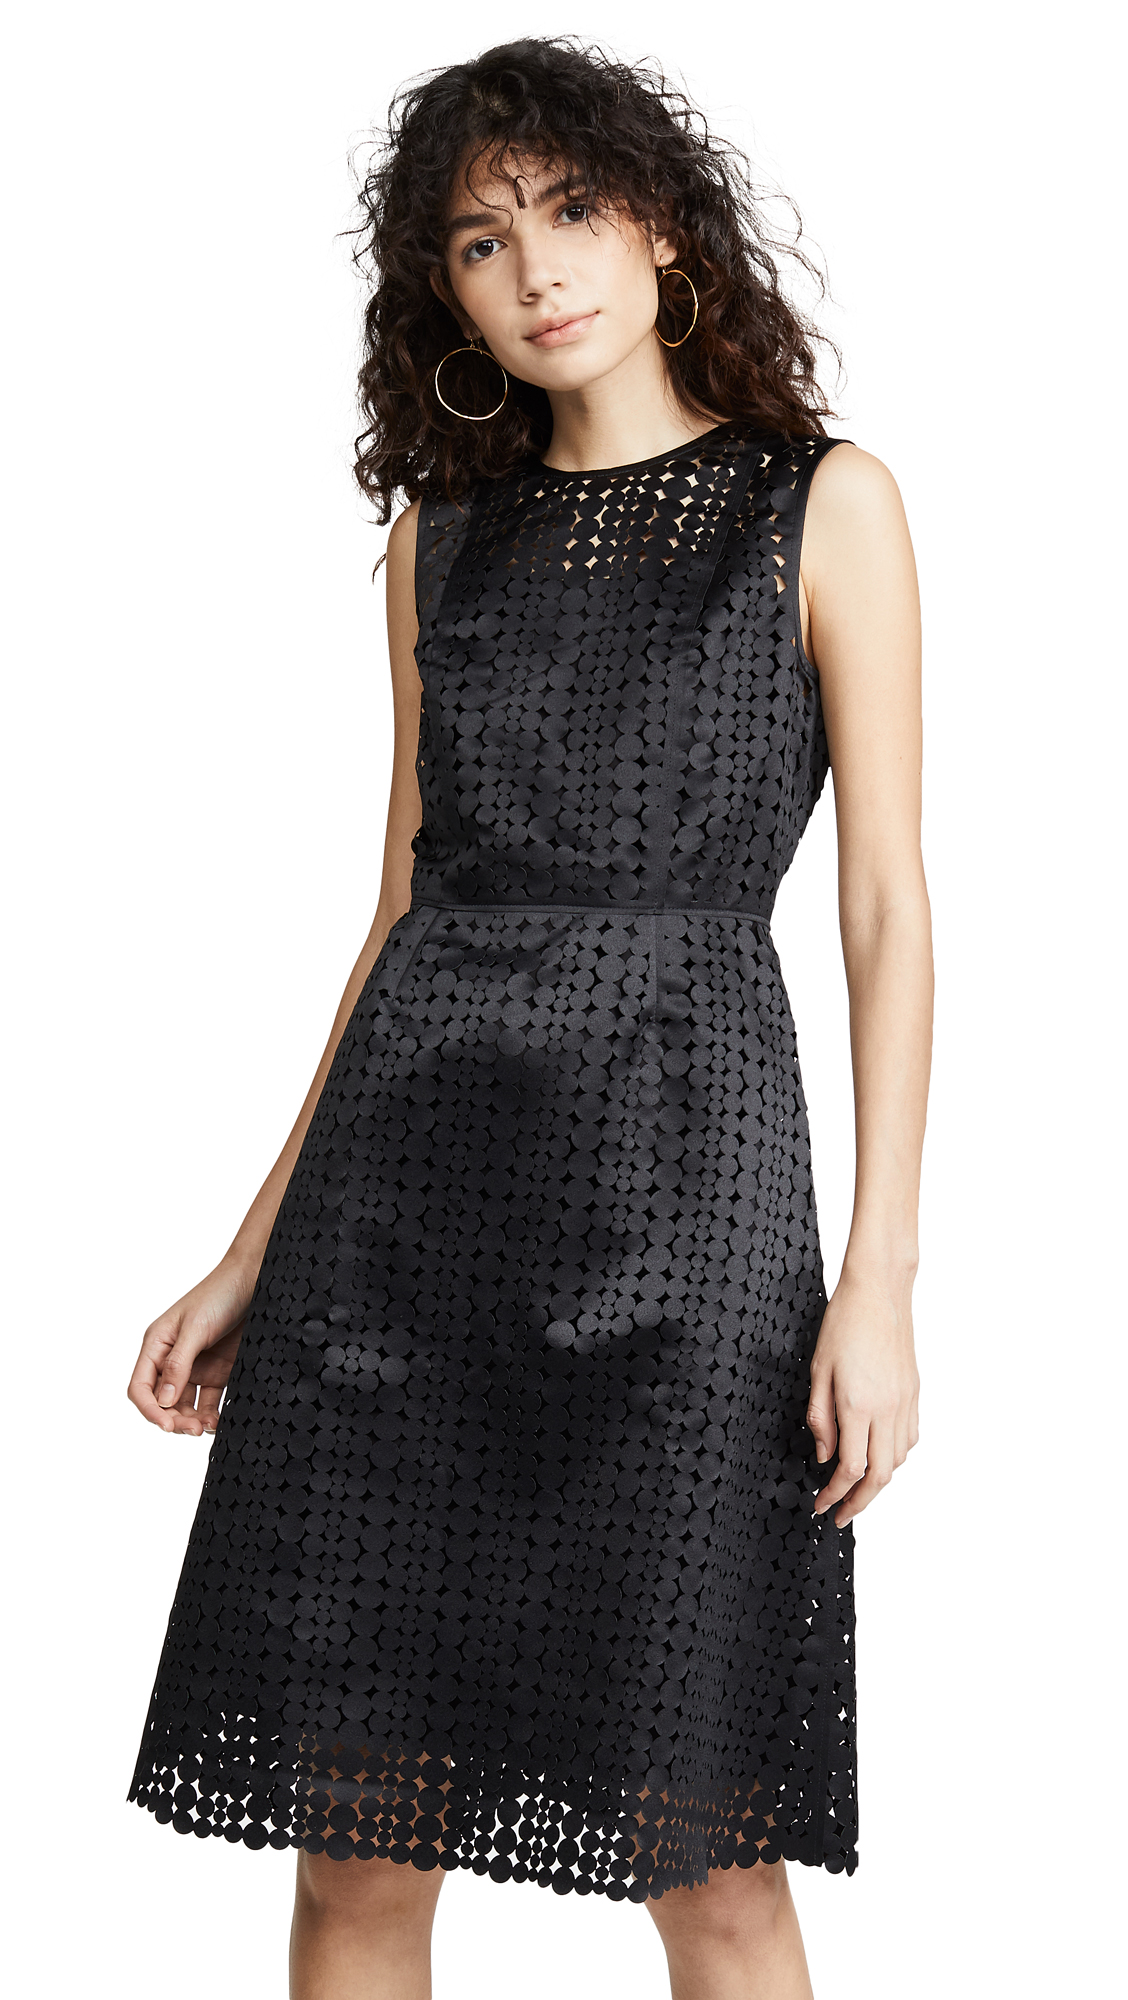 Paskal Laser Cut Sleeveless Dress - Black